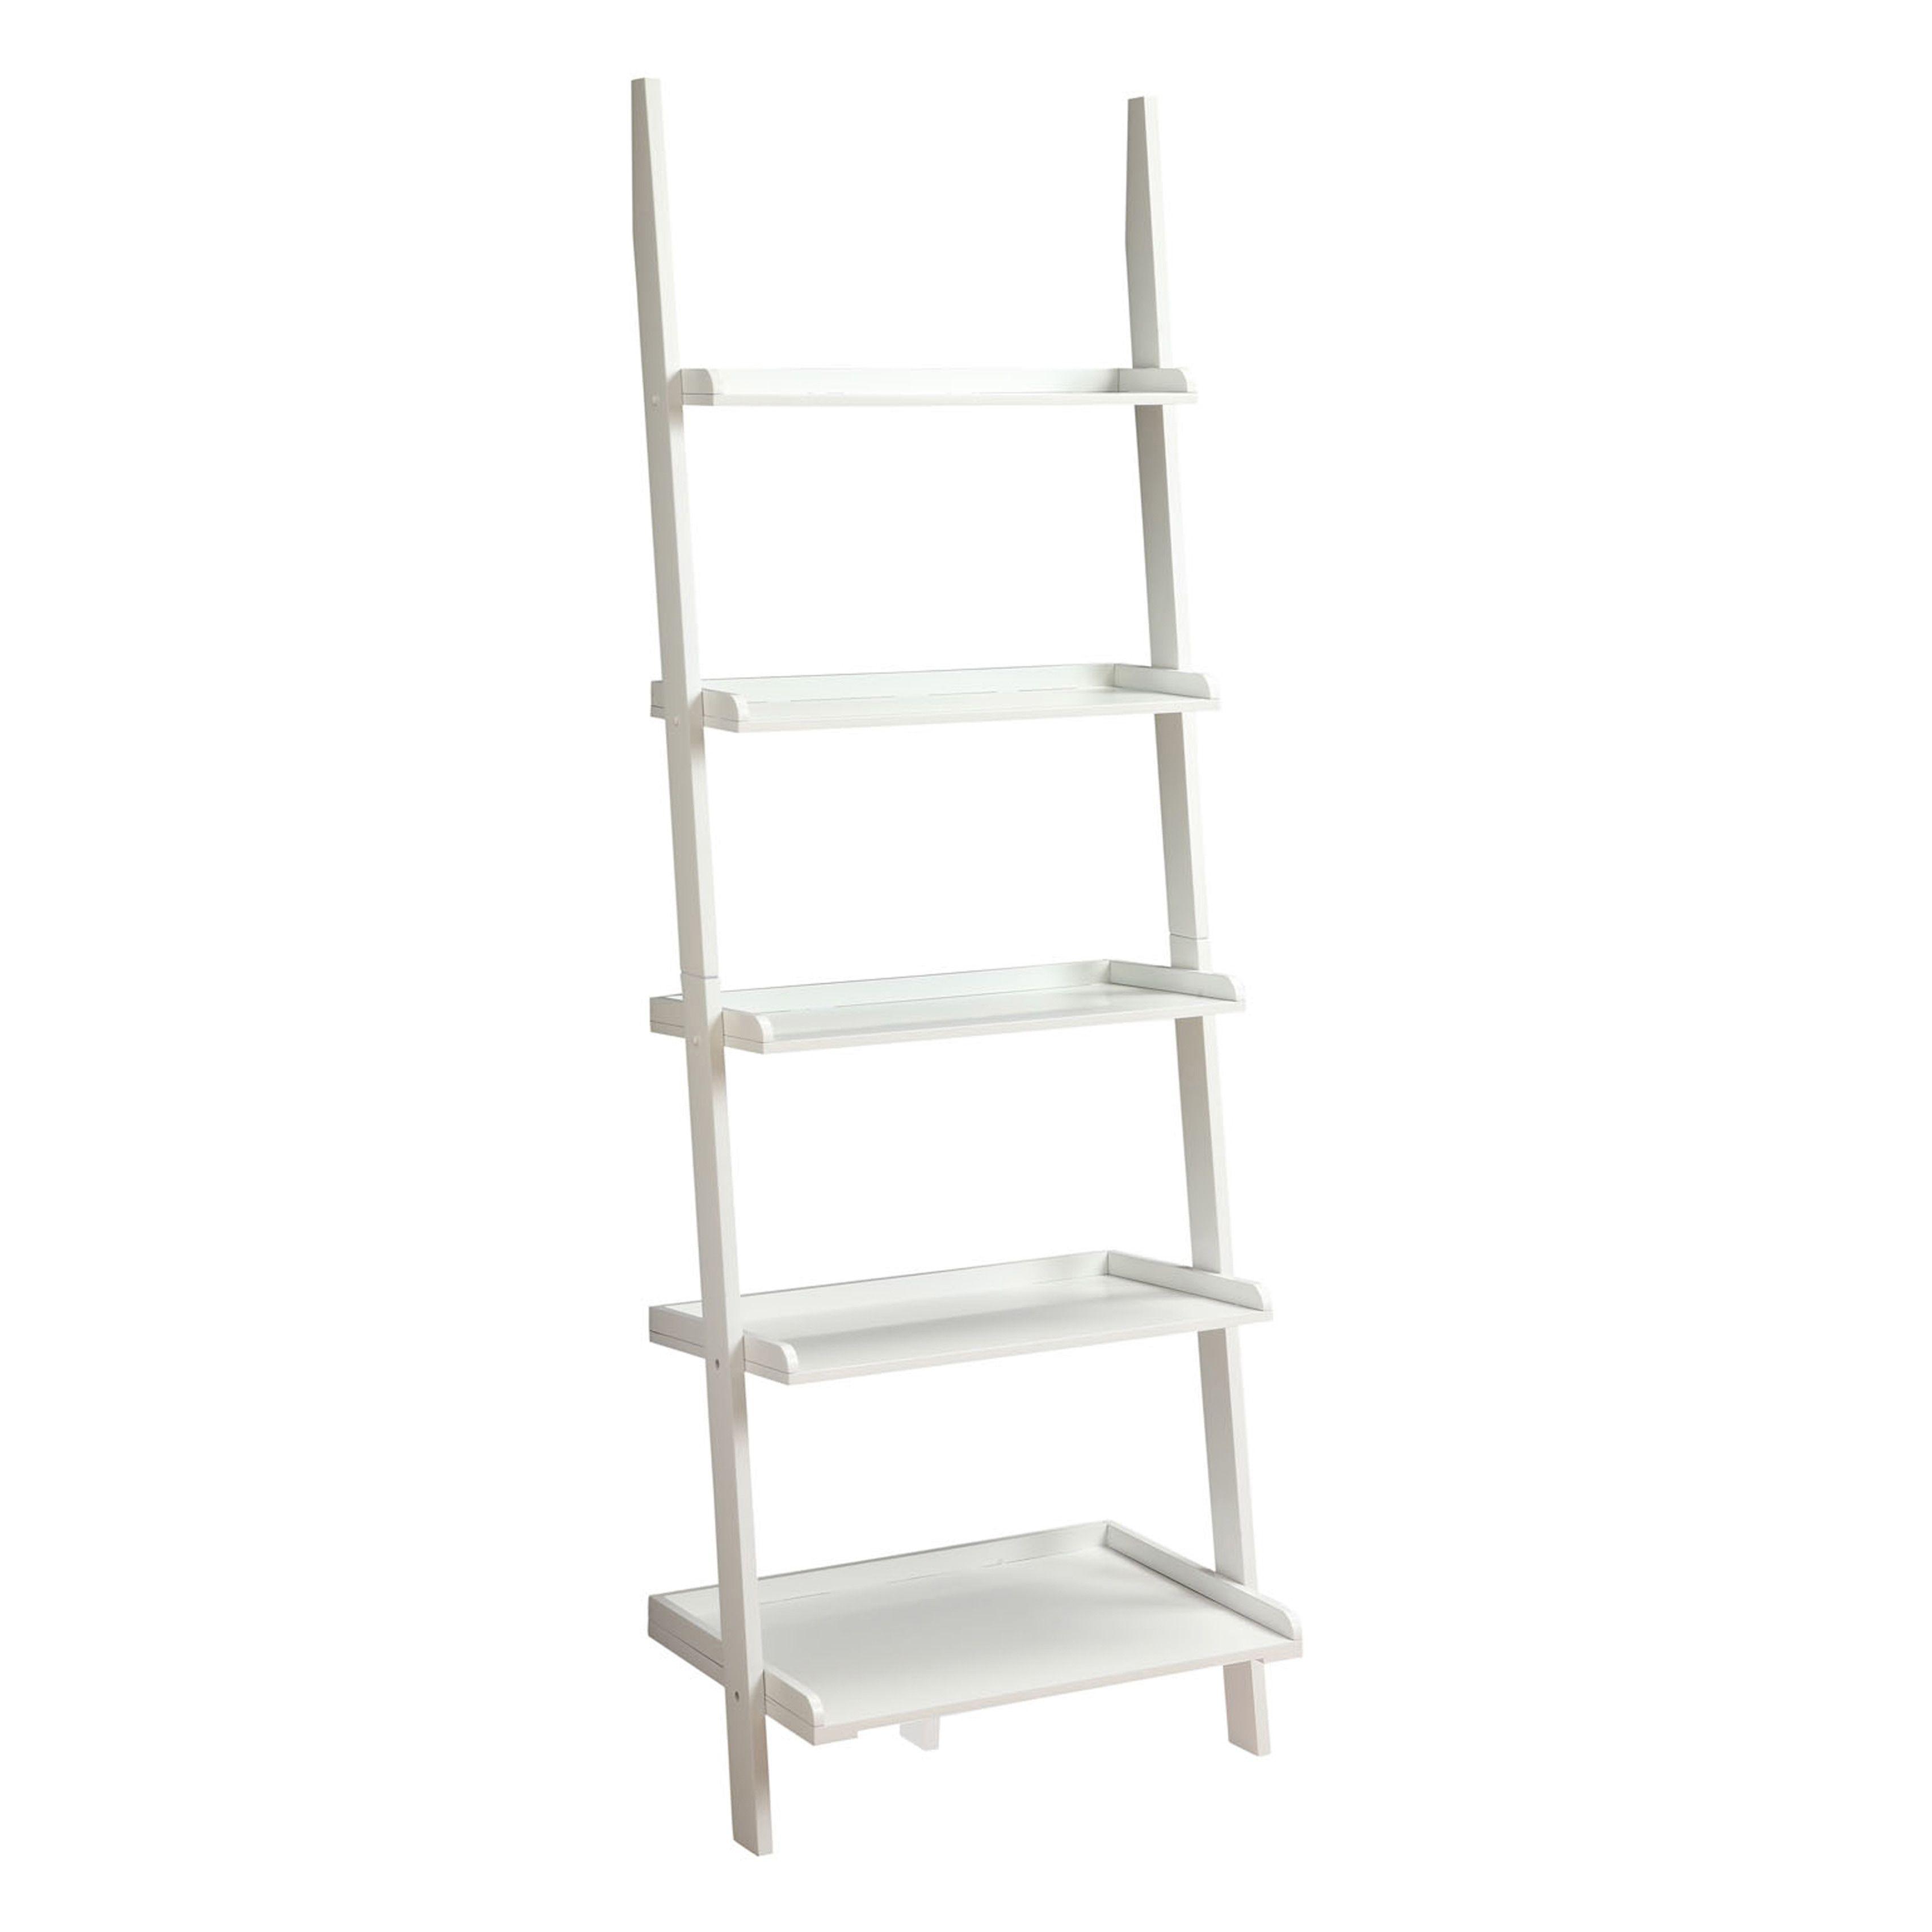 Laurel creek charley wooden bookshelf ladder blue products